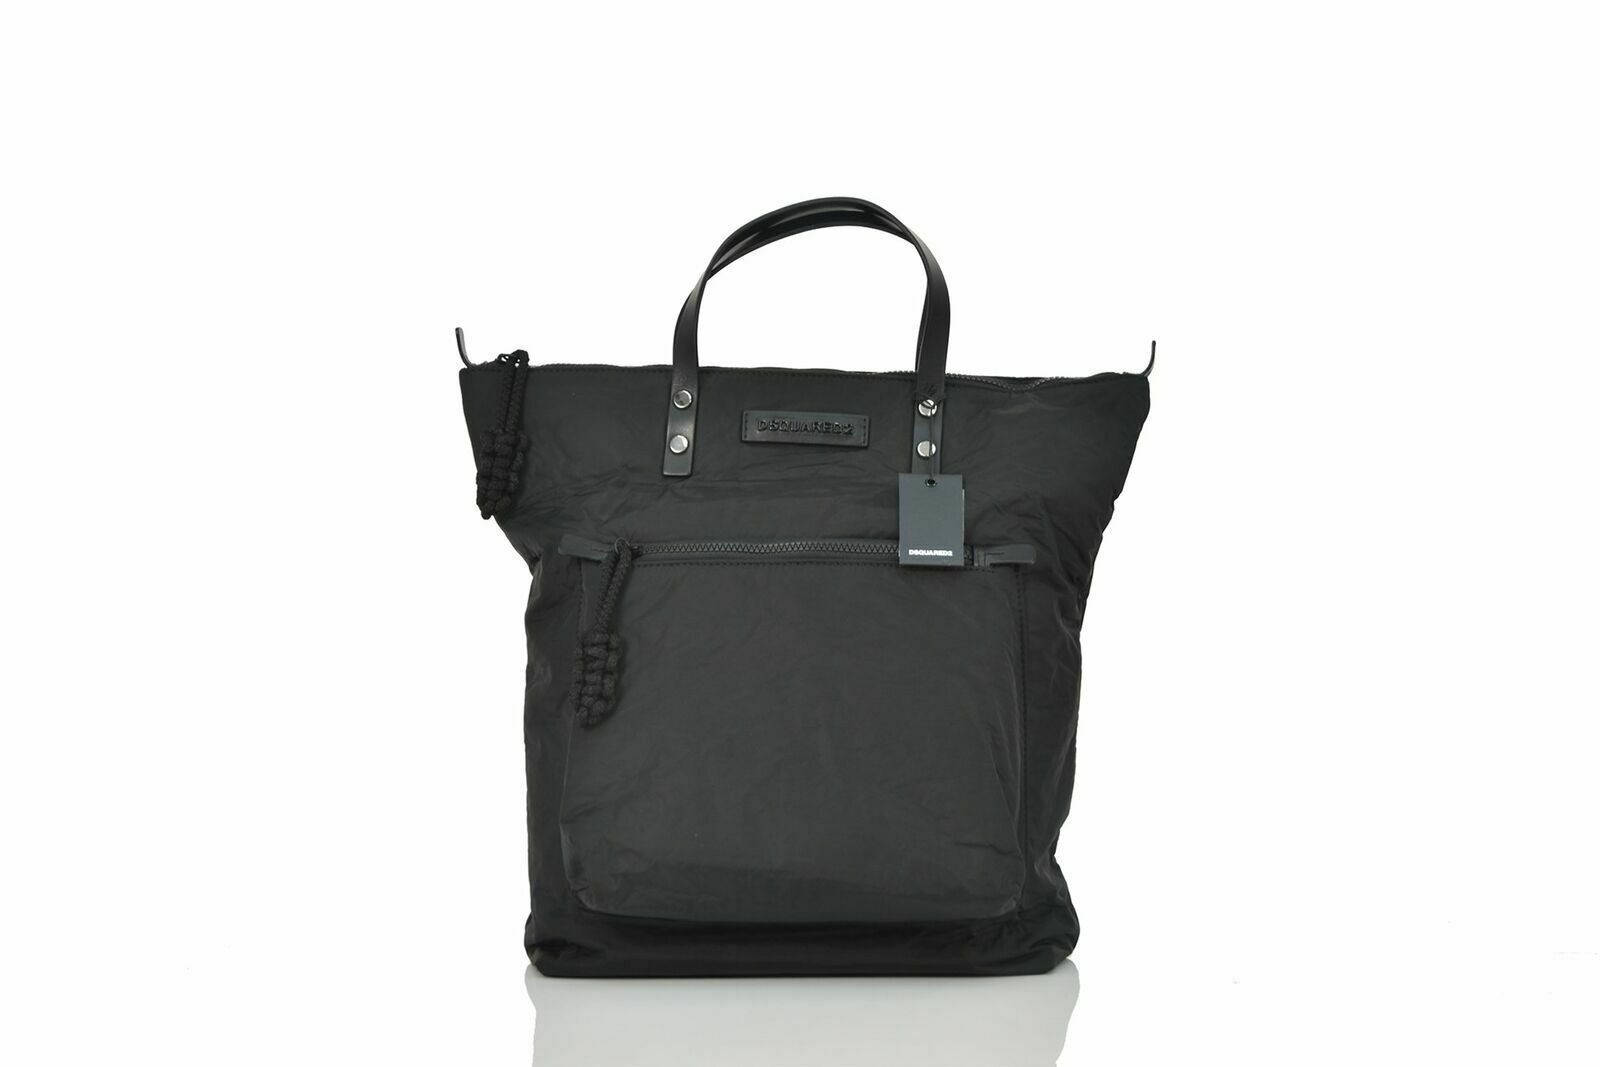 Dsquared2 Shopping Bag Man Black Leather Handles Mod. W16SP1004117M084